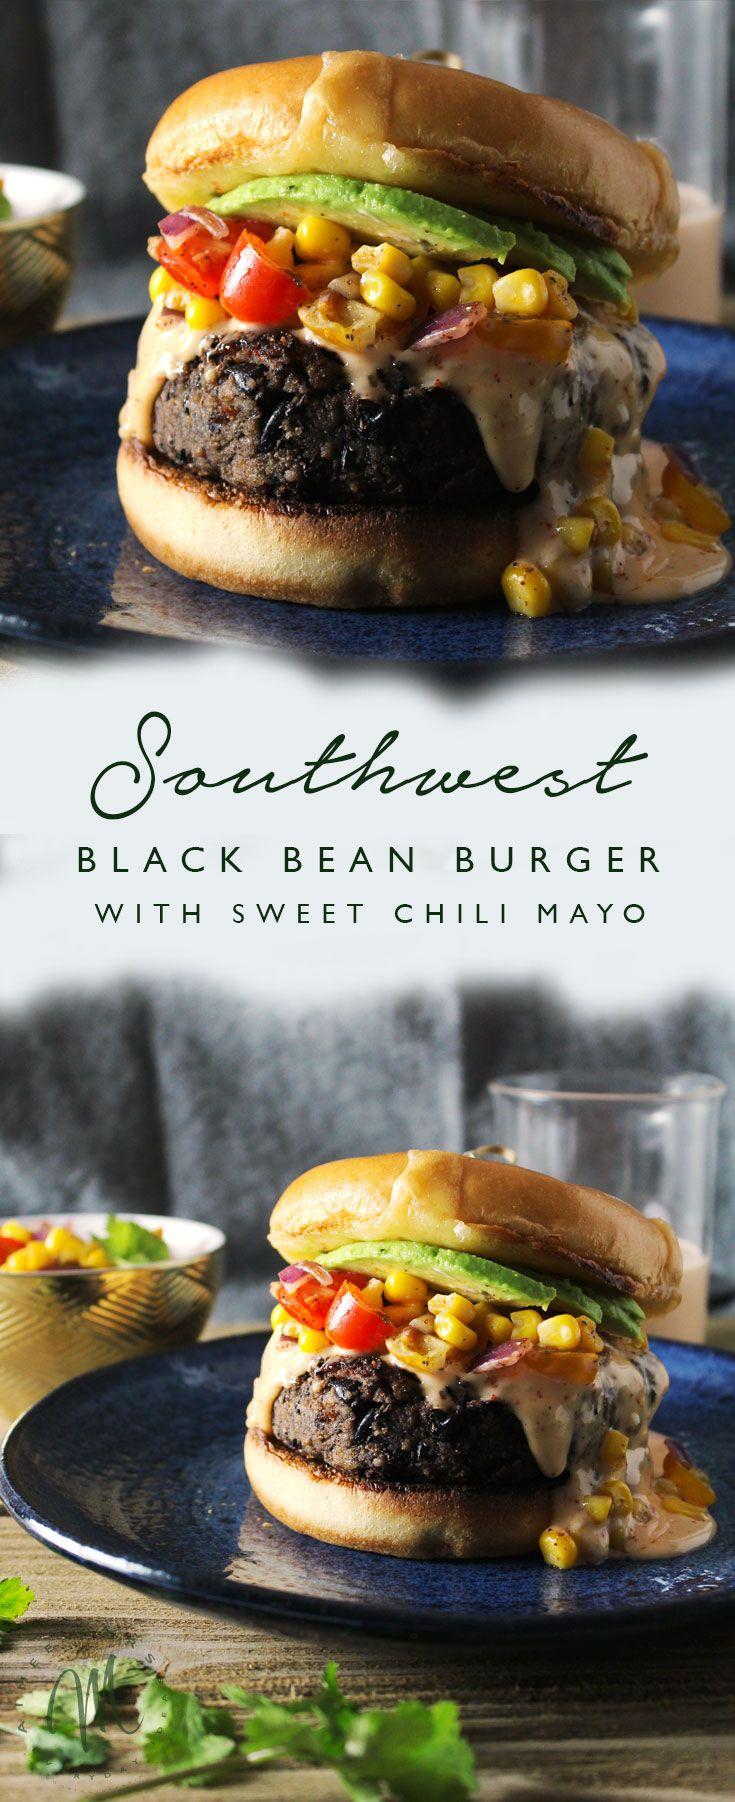 The Southwest Black Bean Burger with Sweet Chili Mayo